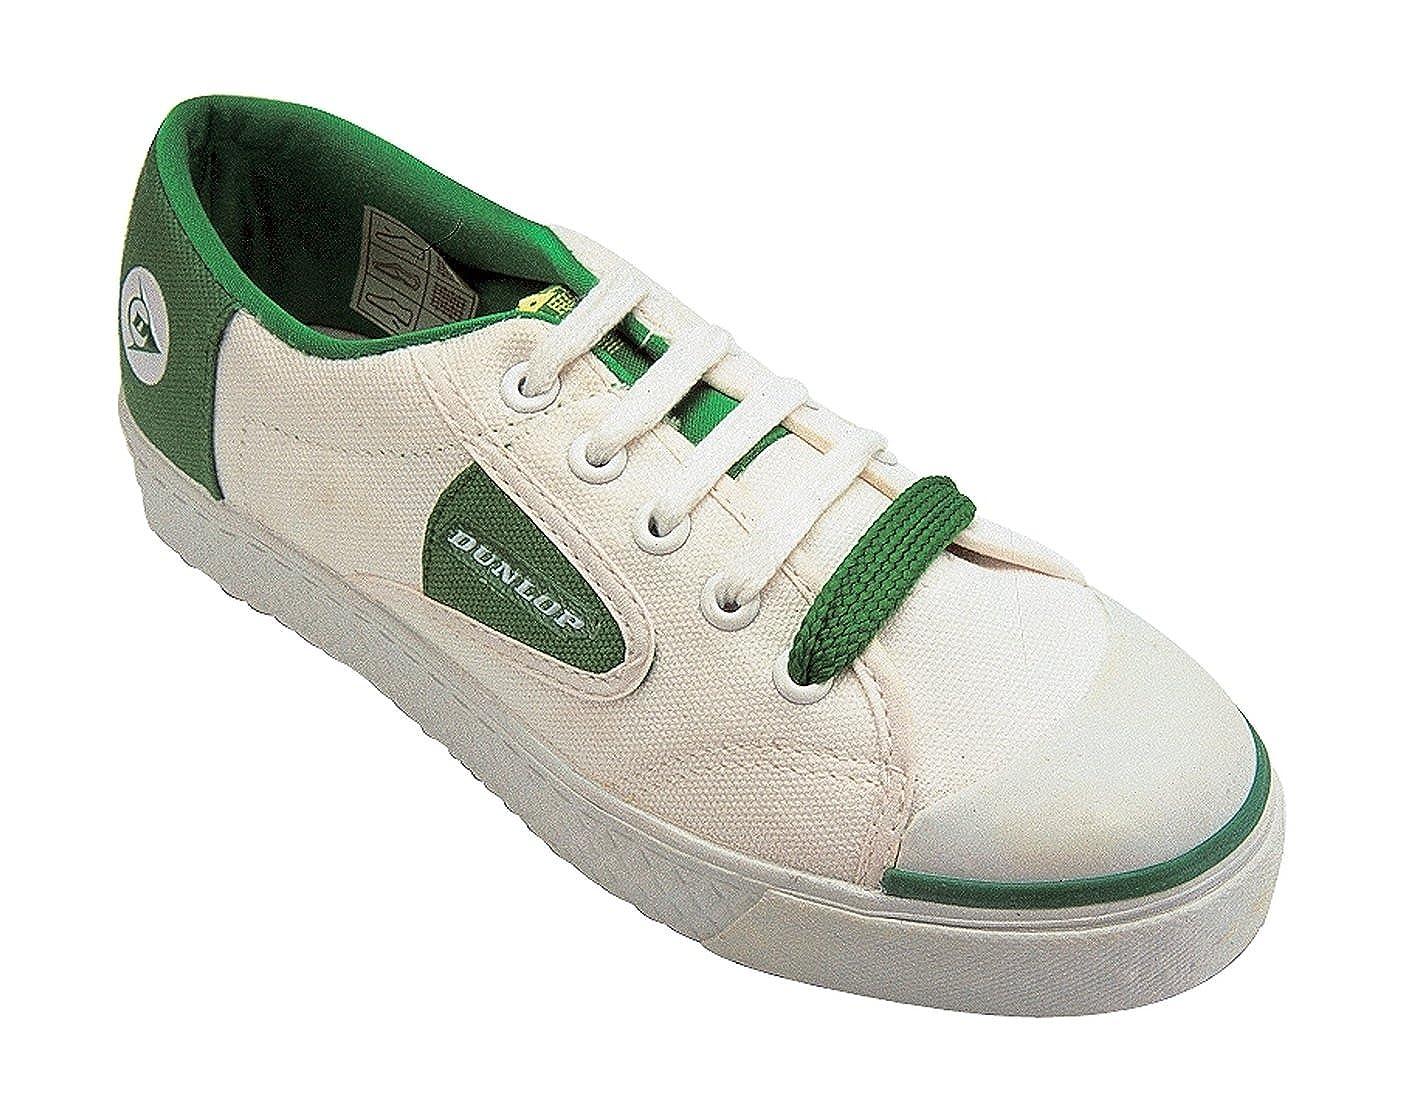 Dunlop Grün Flash DU1555 Sportschuhe (36 EUR) (Weiß)